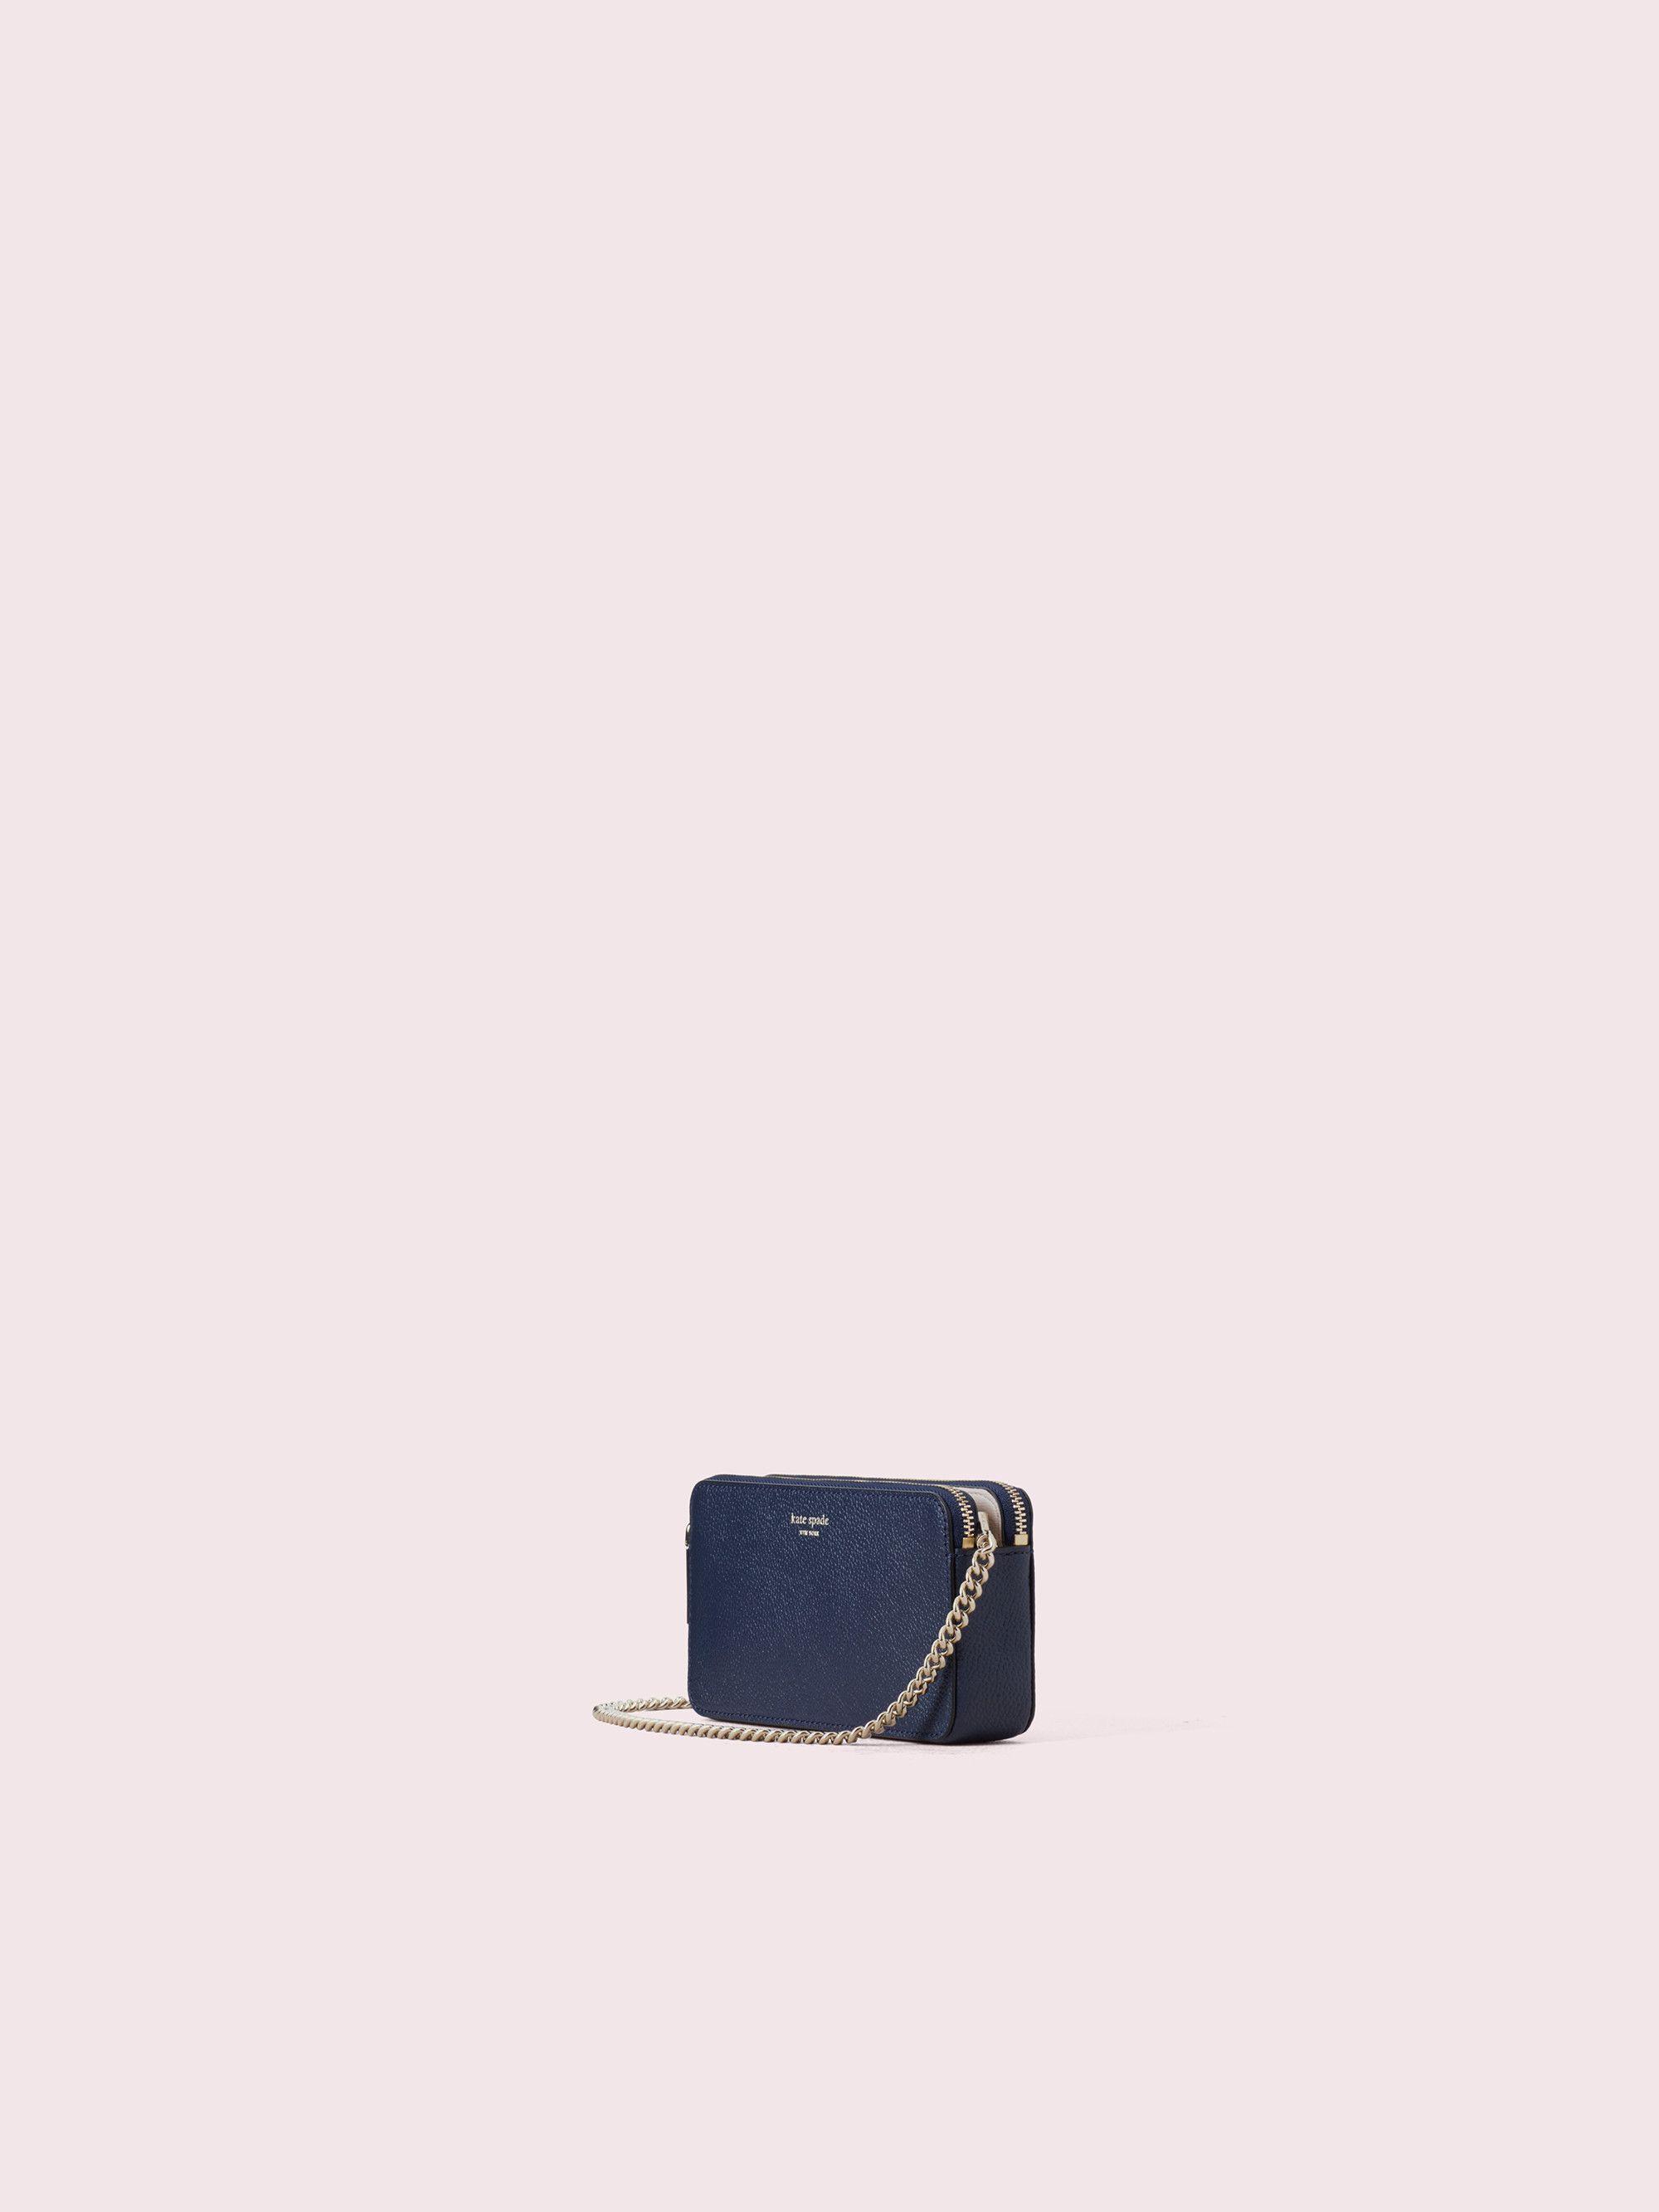 6bde53d2e Kate Spade Margaux Double-zip Mini Crossbody, Blazer Blue in 2019 ...